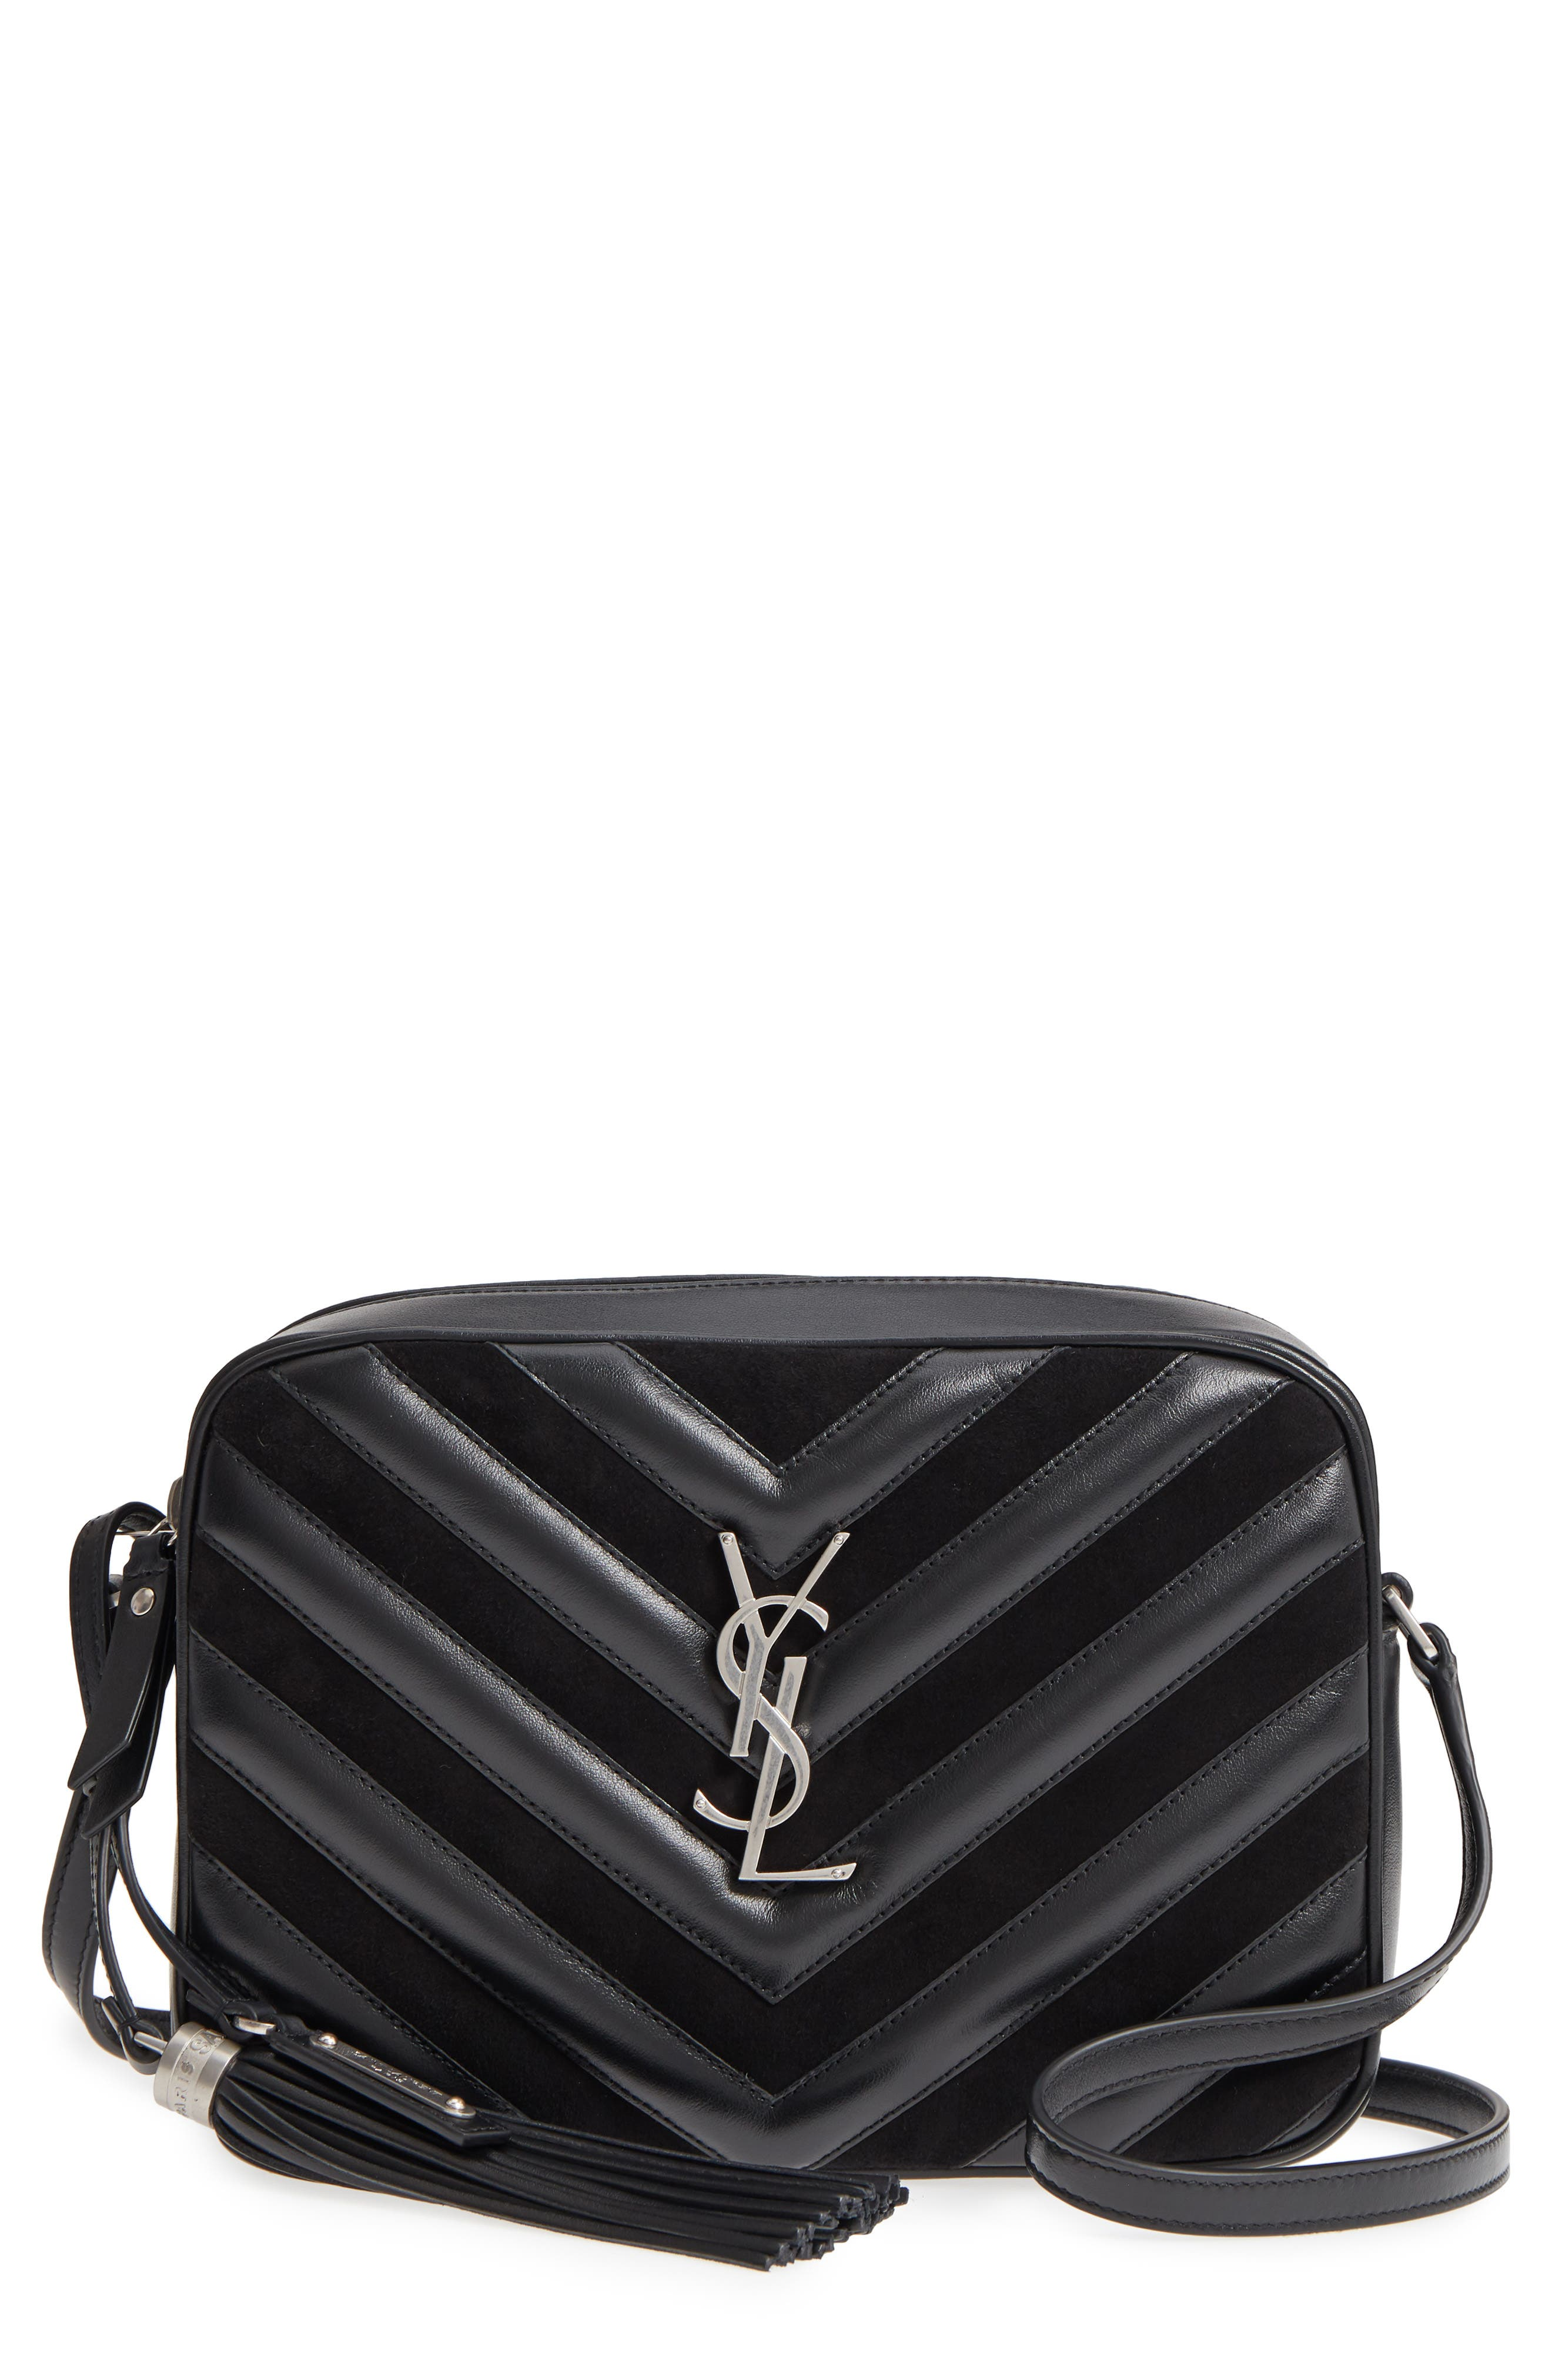 Medium Lou Leather & Suede Camera Bag,                         Main,                         color, Noir